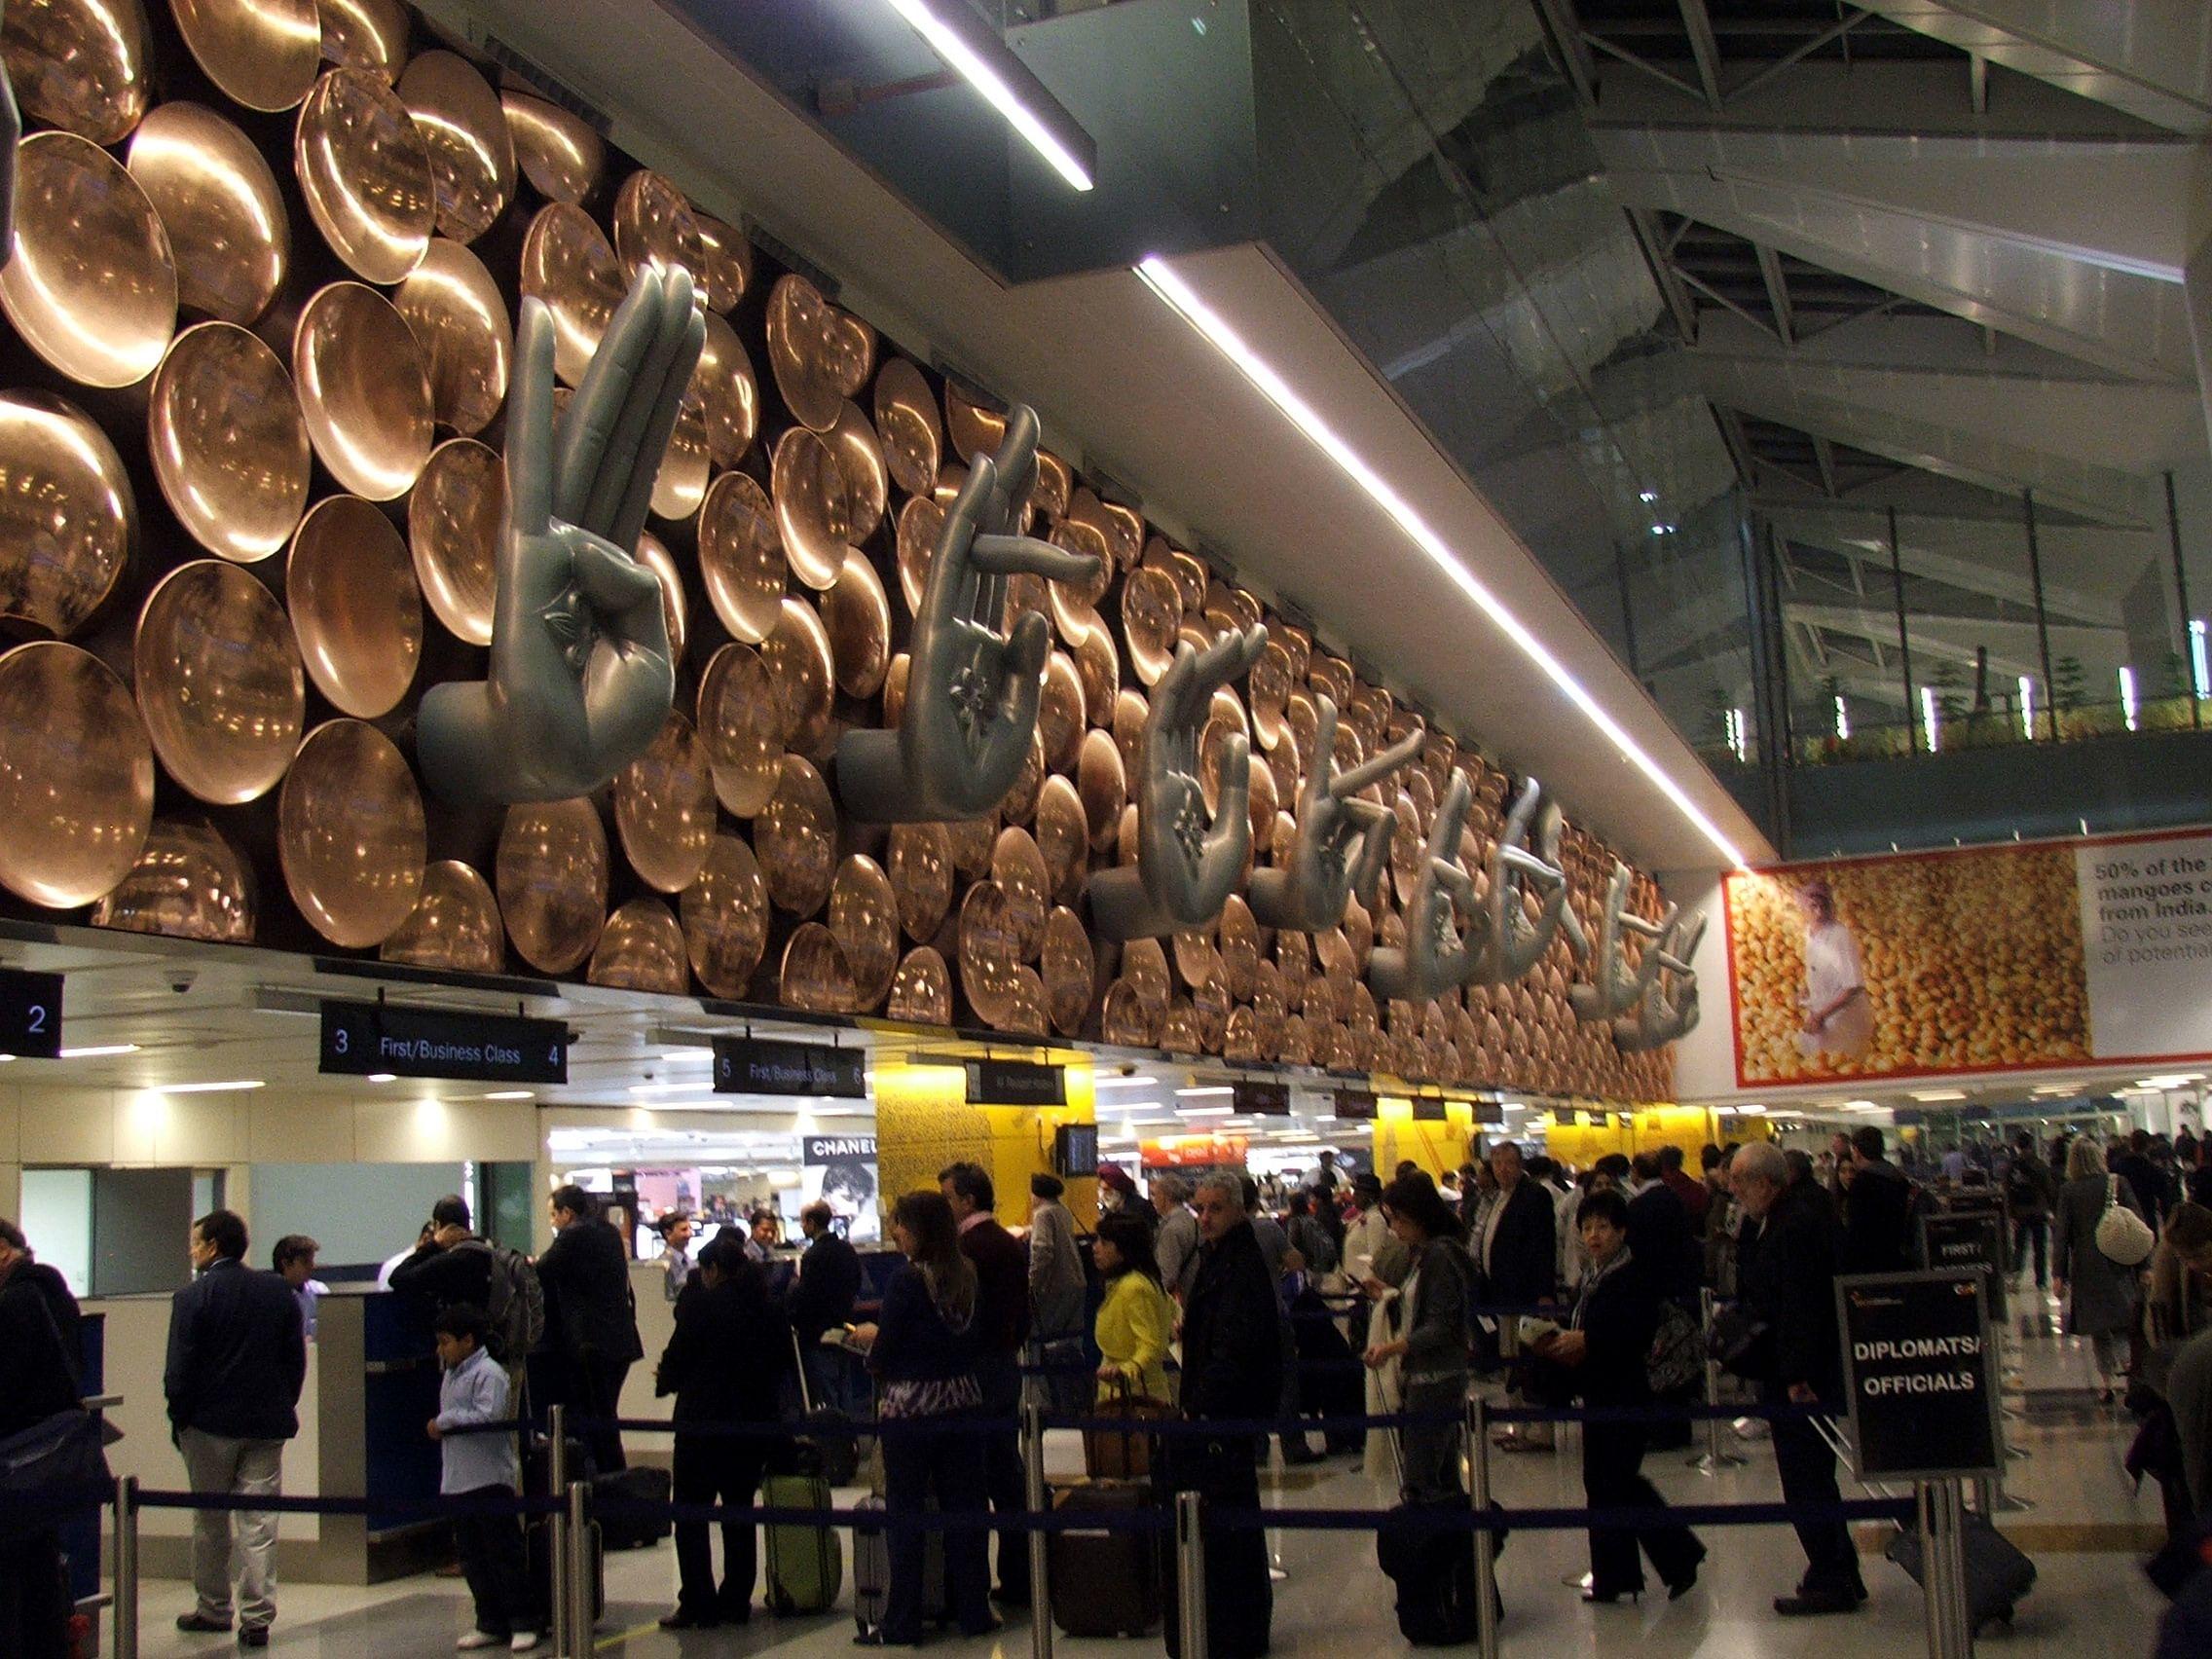 Mudras at arrival of T3 terminal, Delhi. Picture Source: Krokodyl/Wikimedia